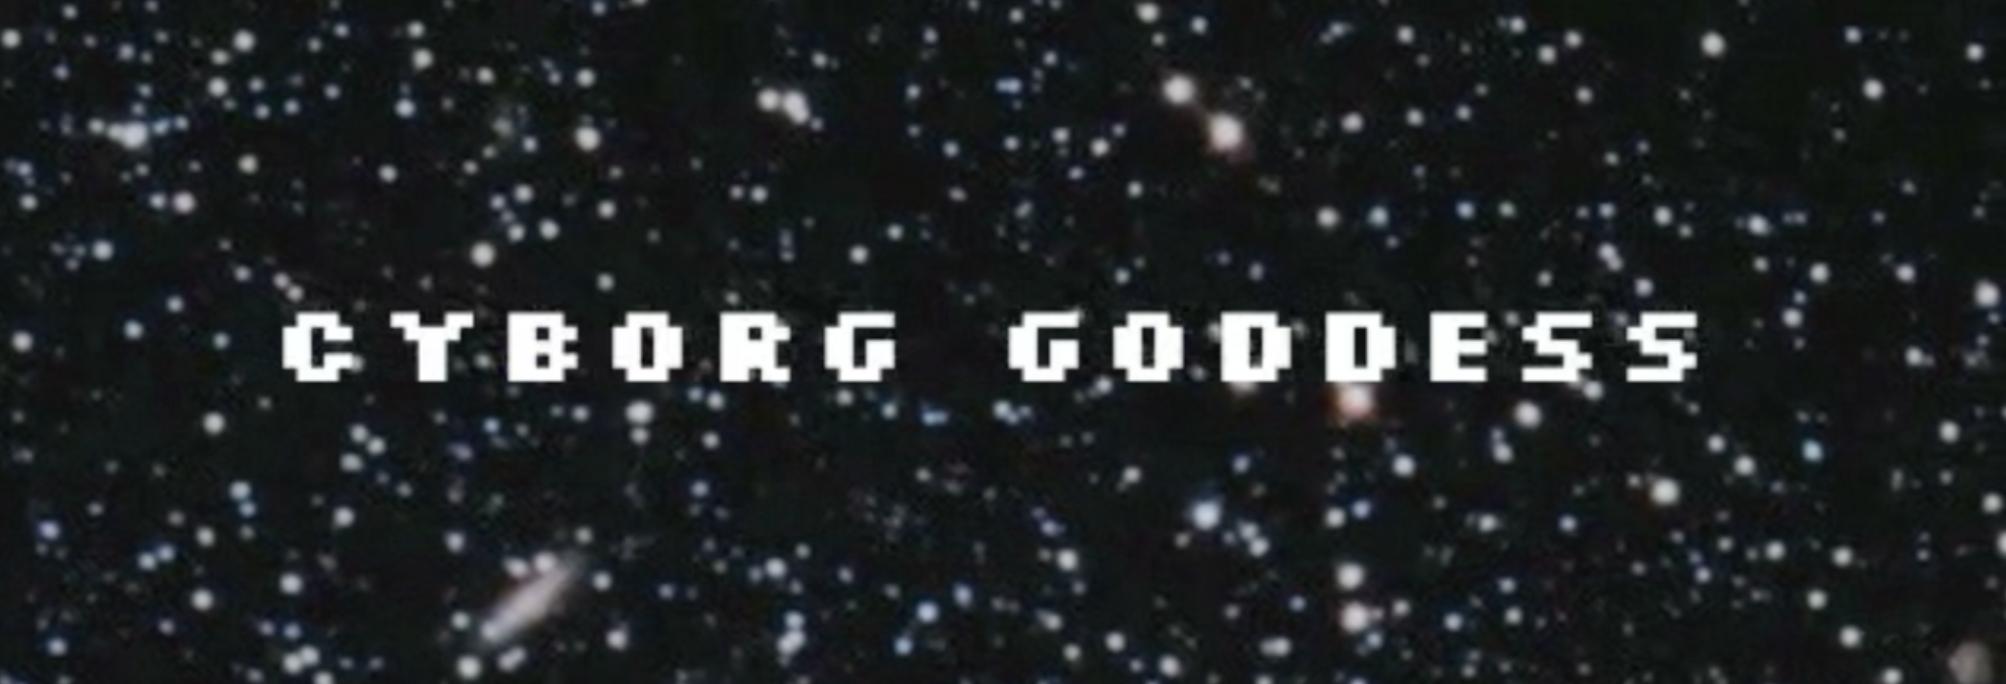 Cyborg Goddess